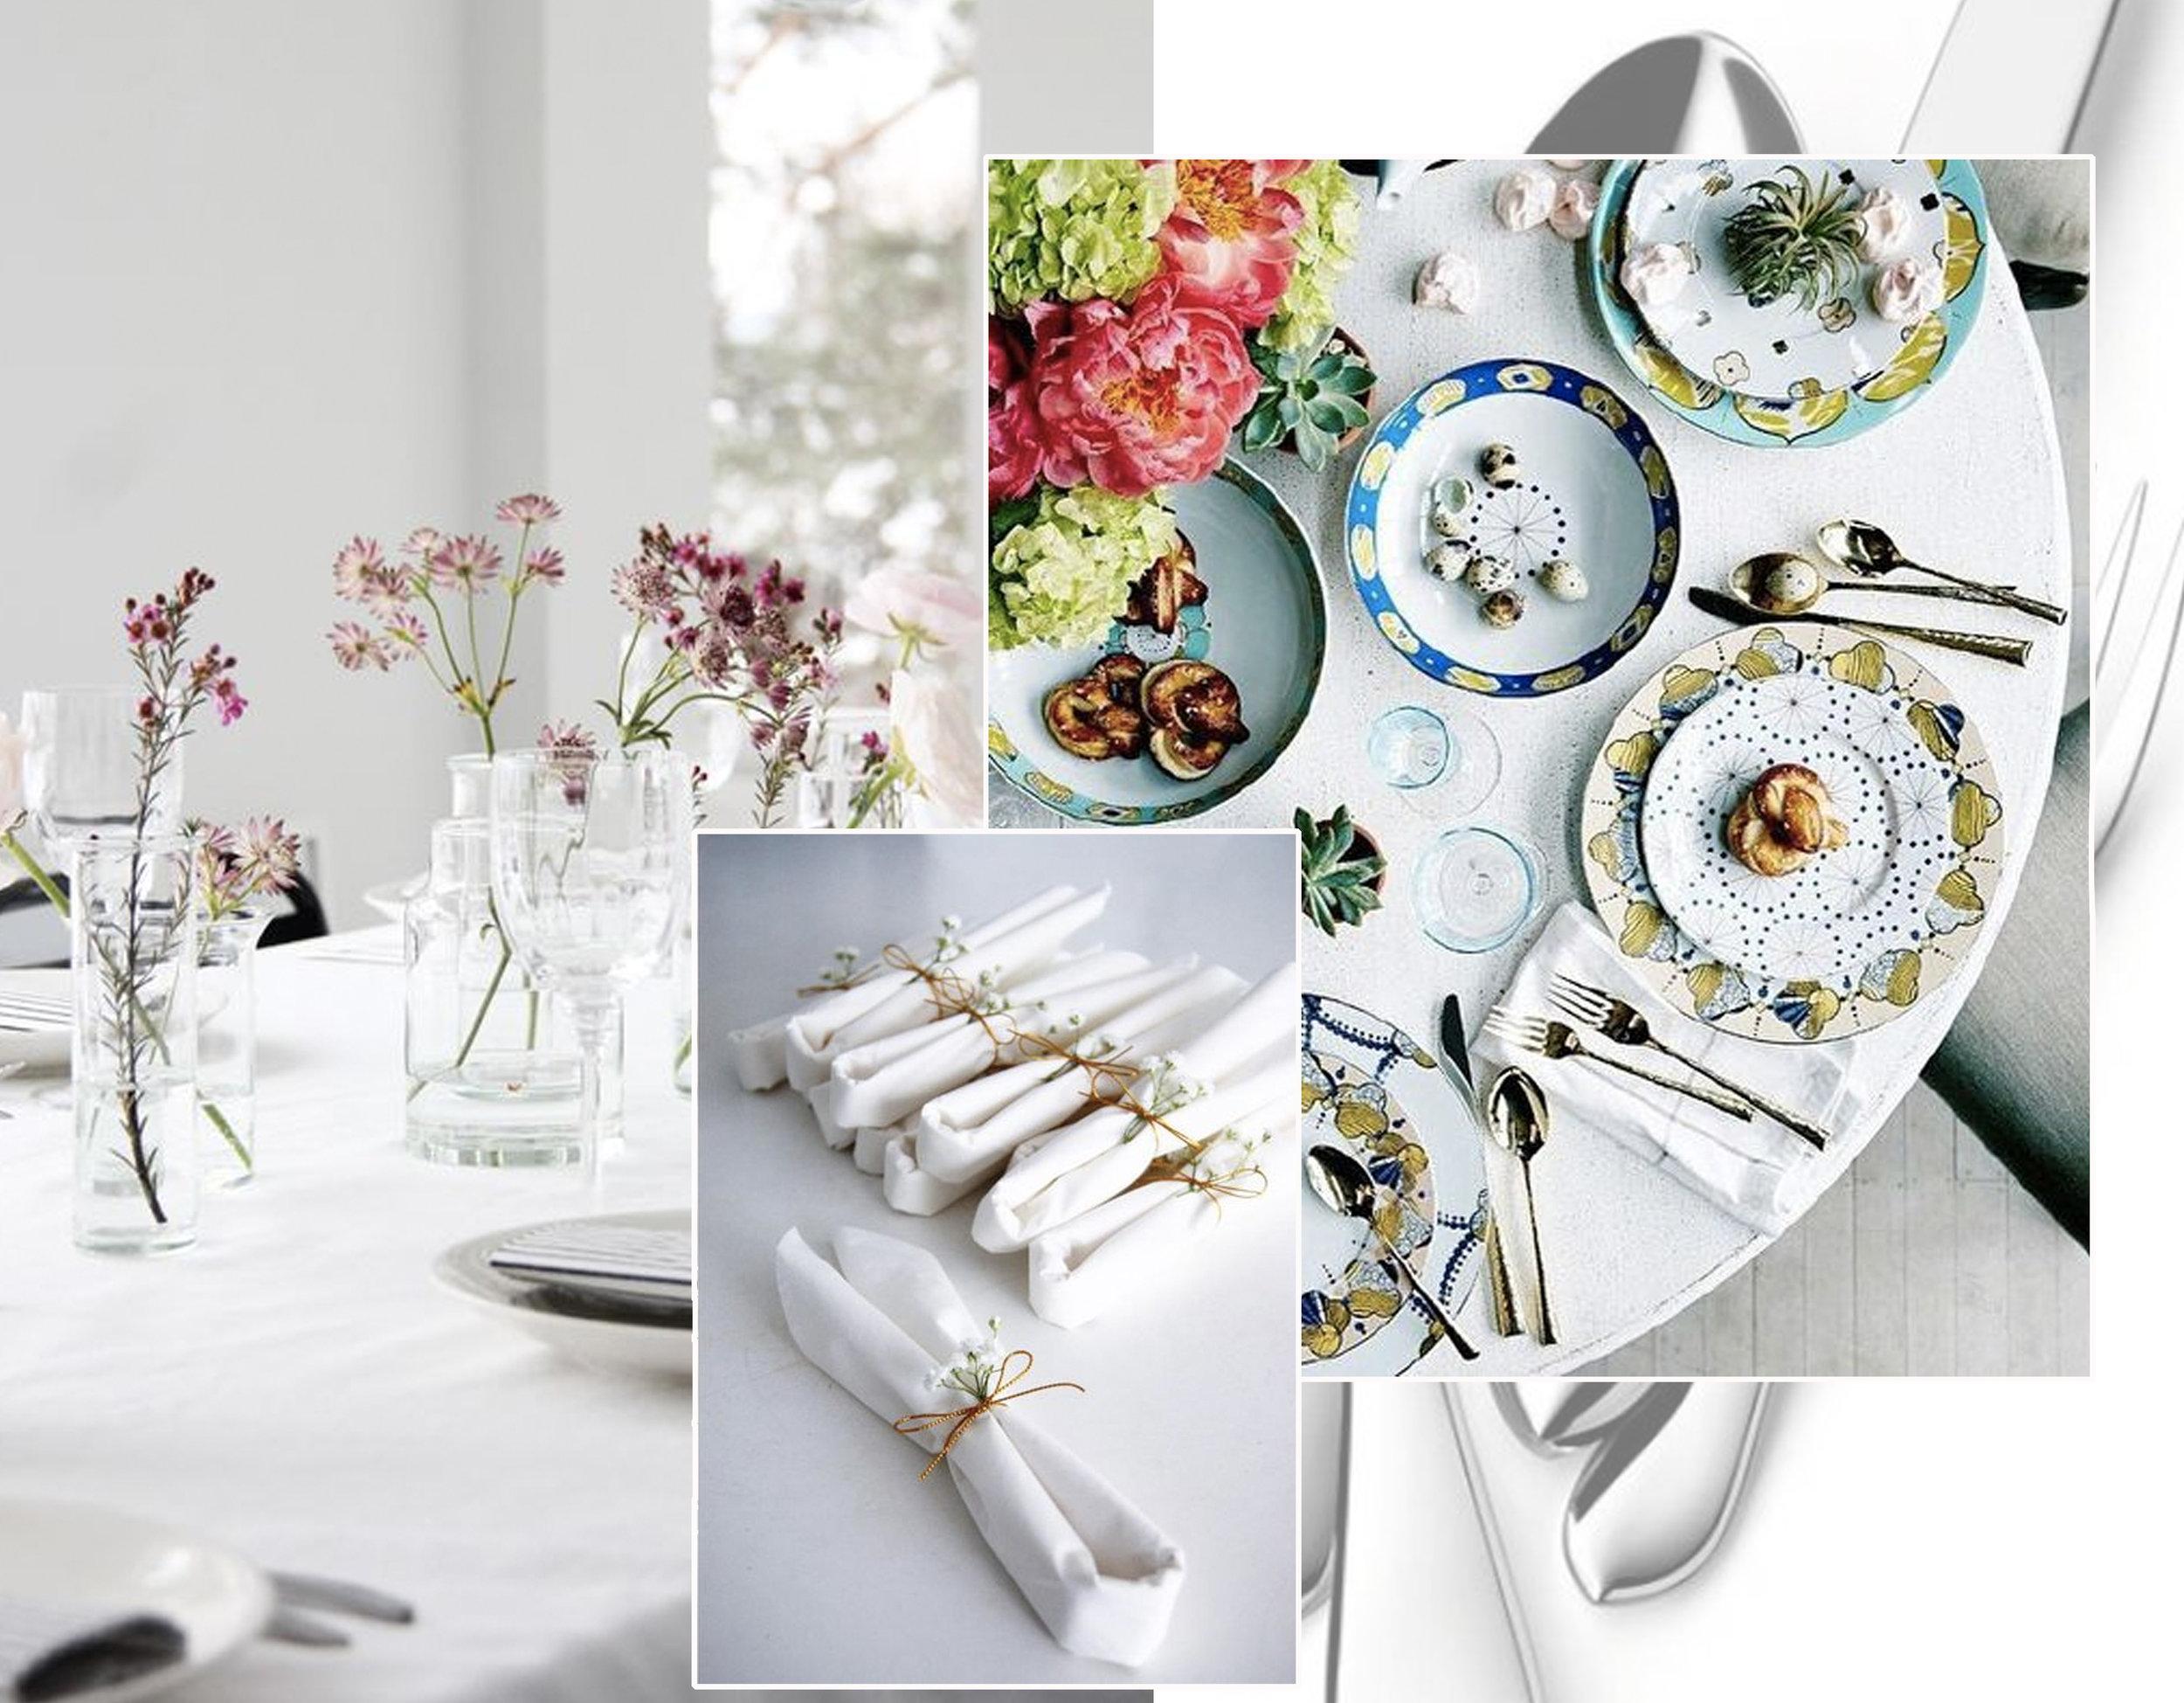 decorating table with some simple flowers via  Elisabeth Heier  - napkins via  Instagram